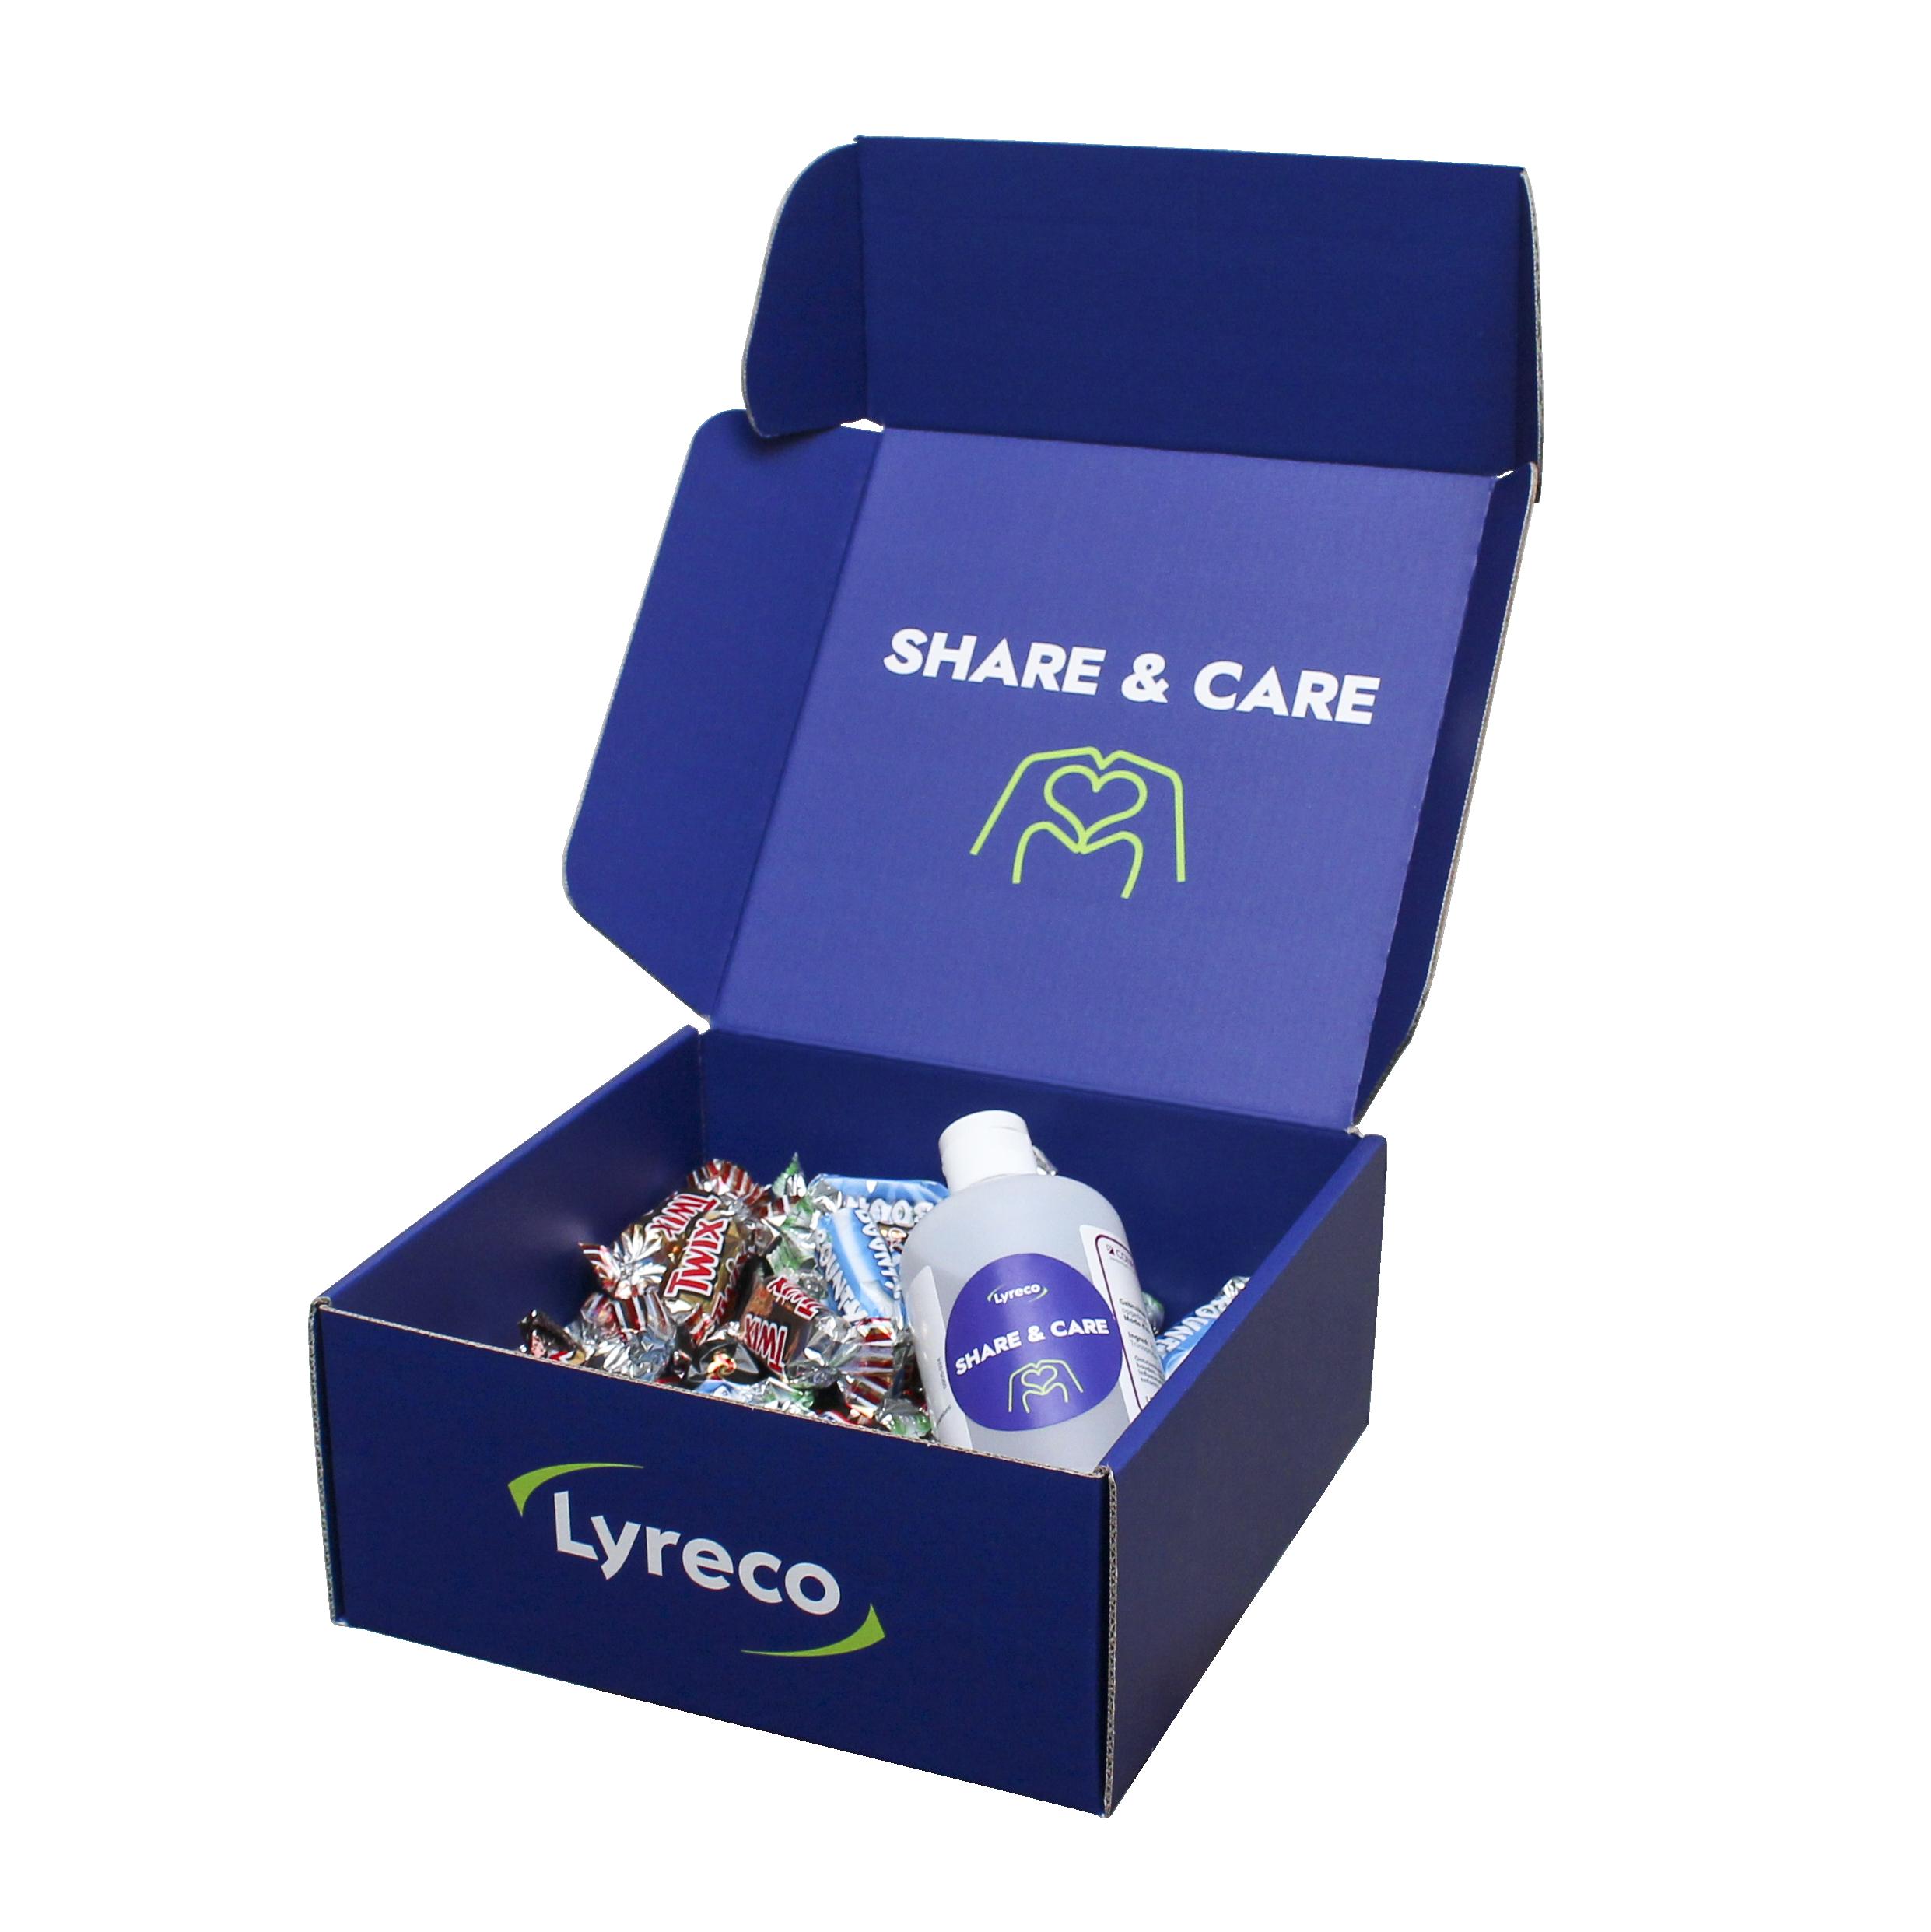 gift share